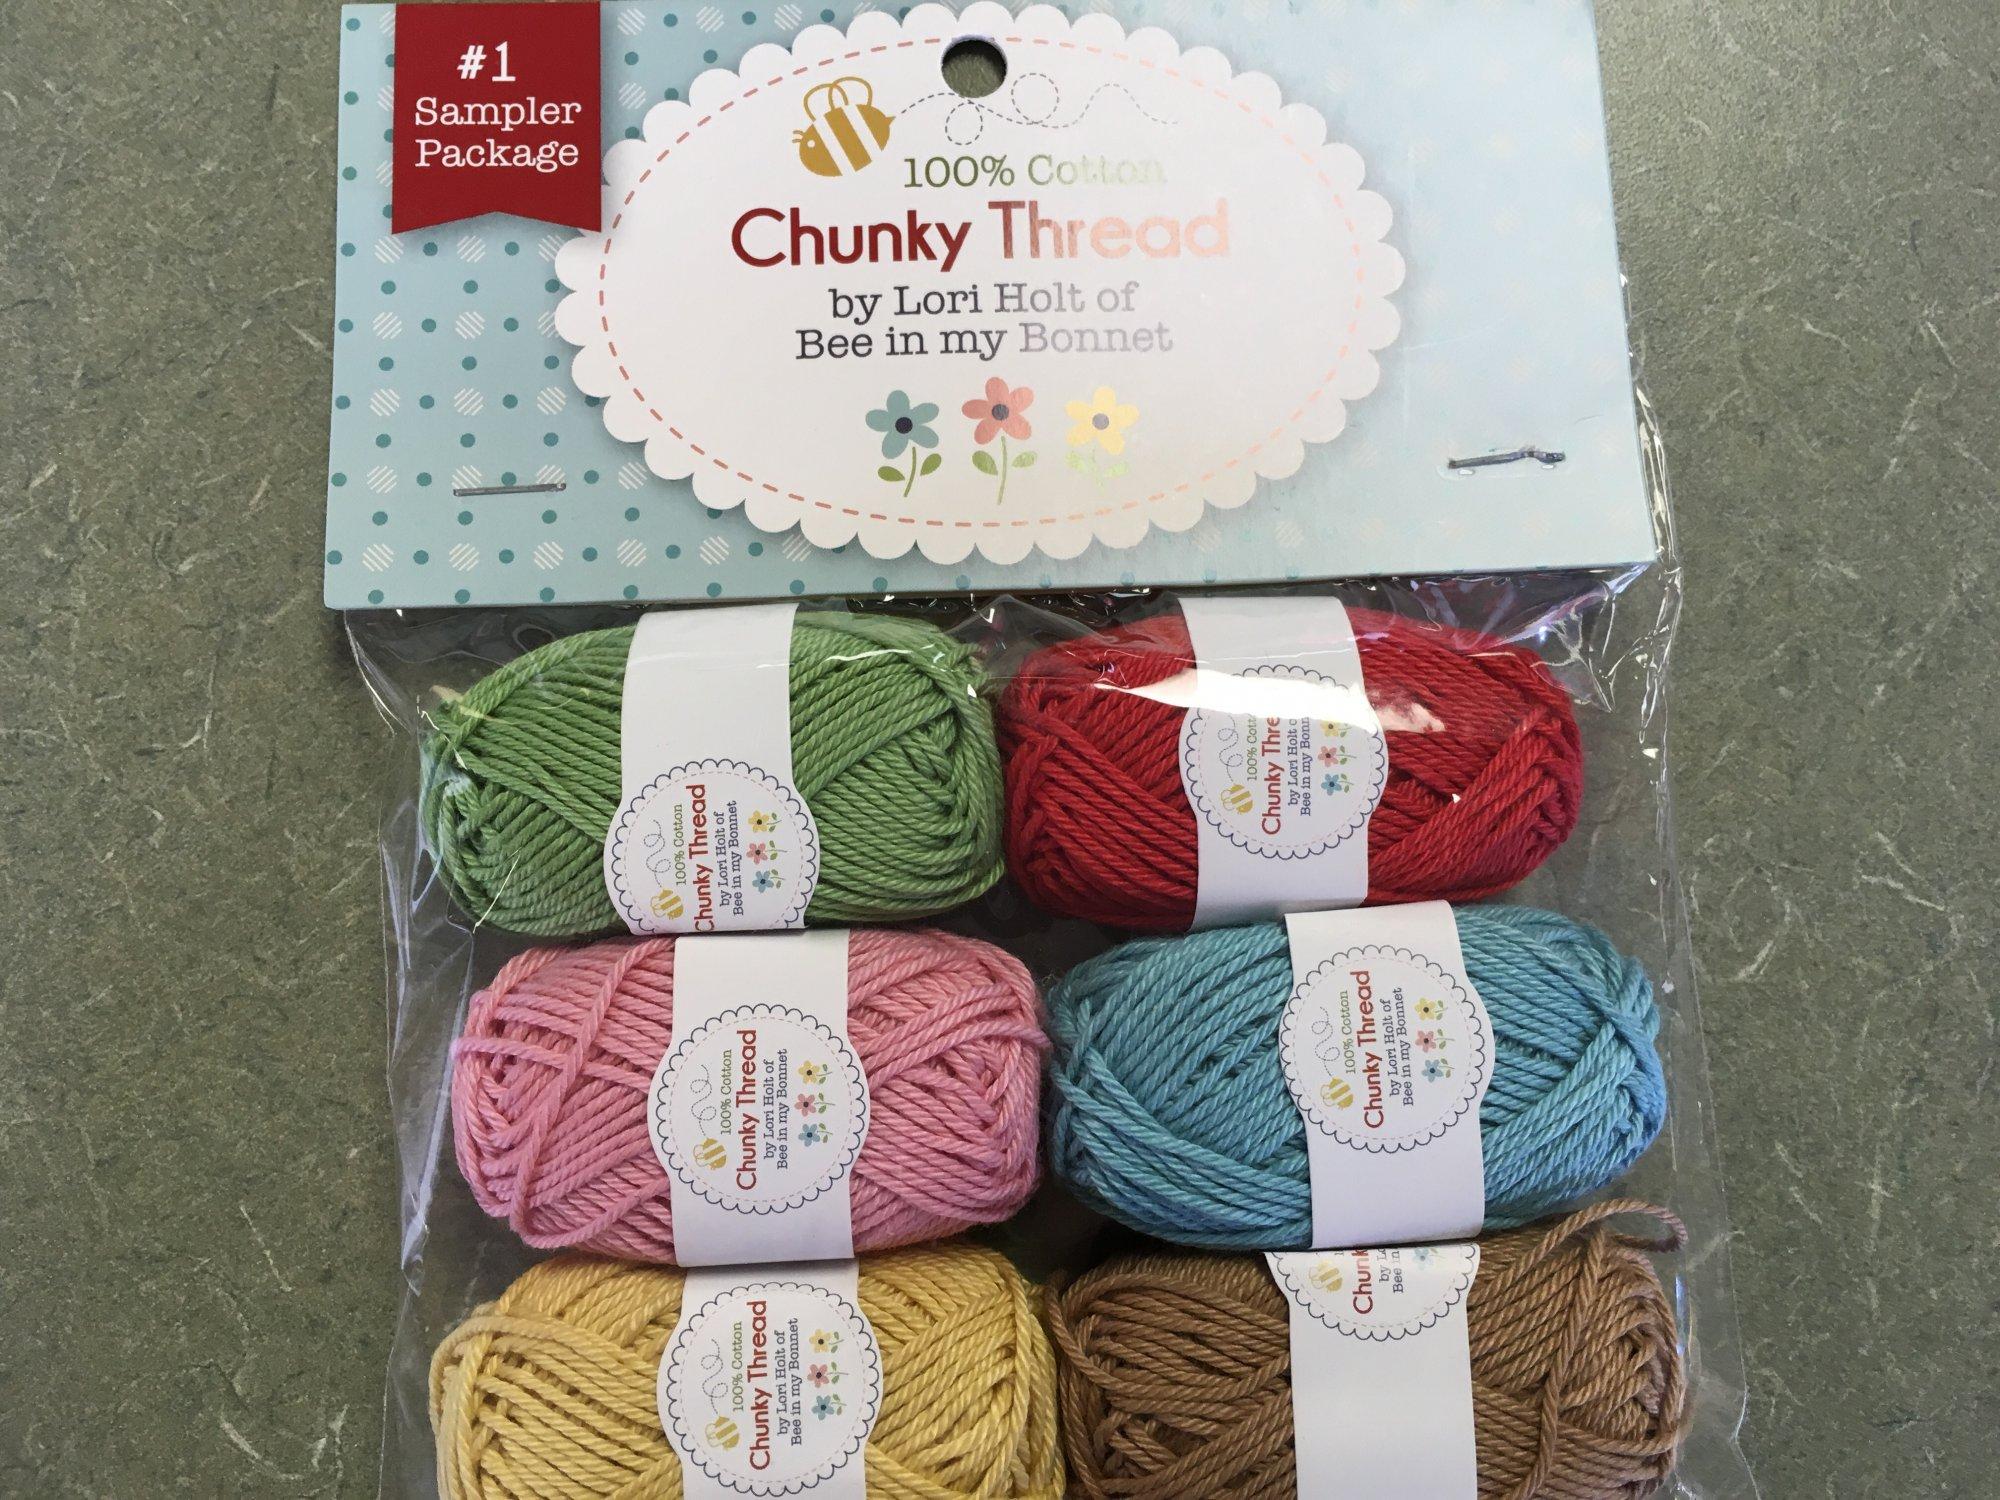 Chunky Thread #1 Sampler 6 pack STCT8526